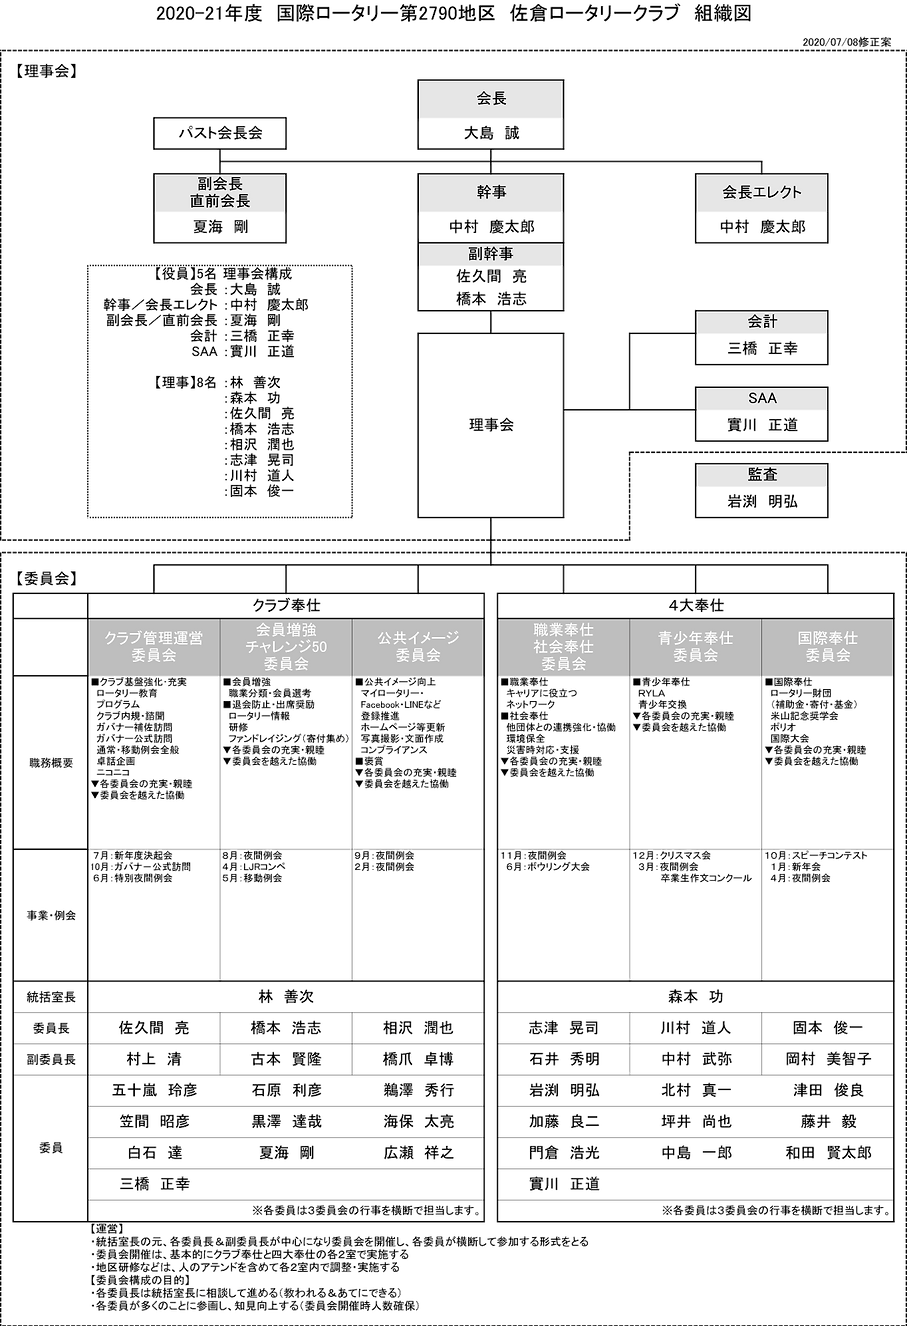 2020-21組織図.png